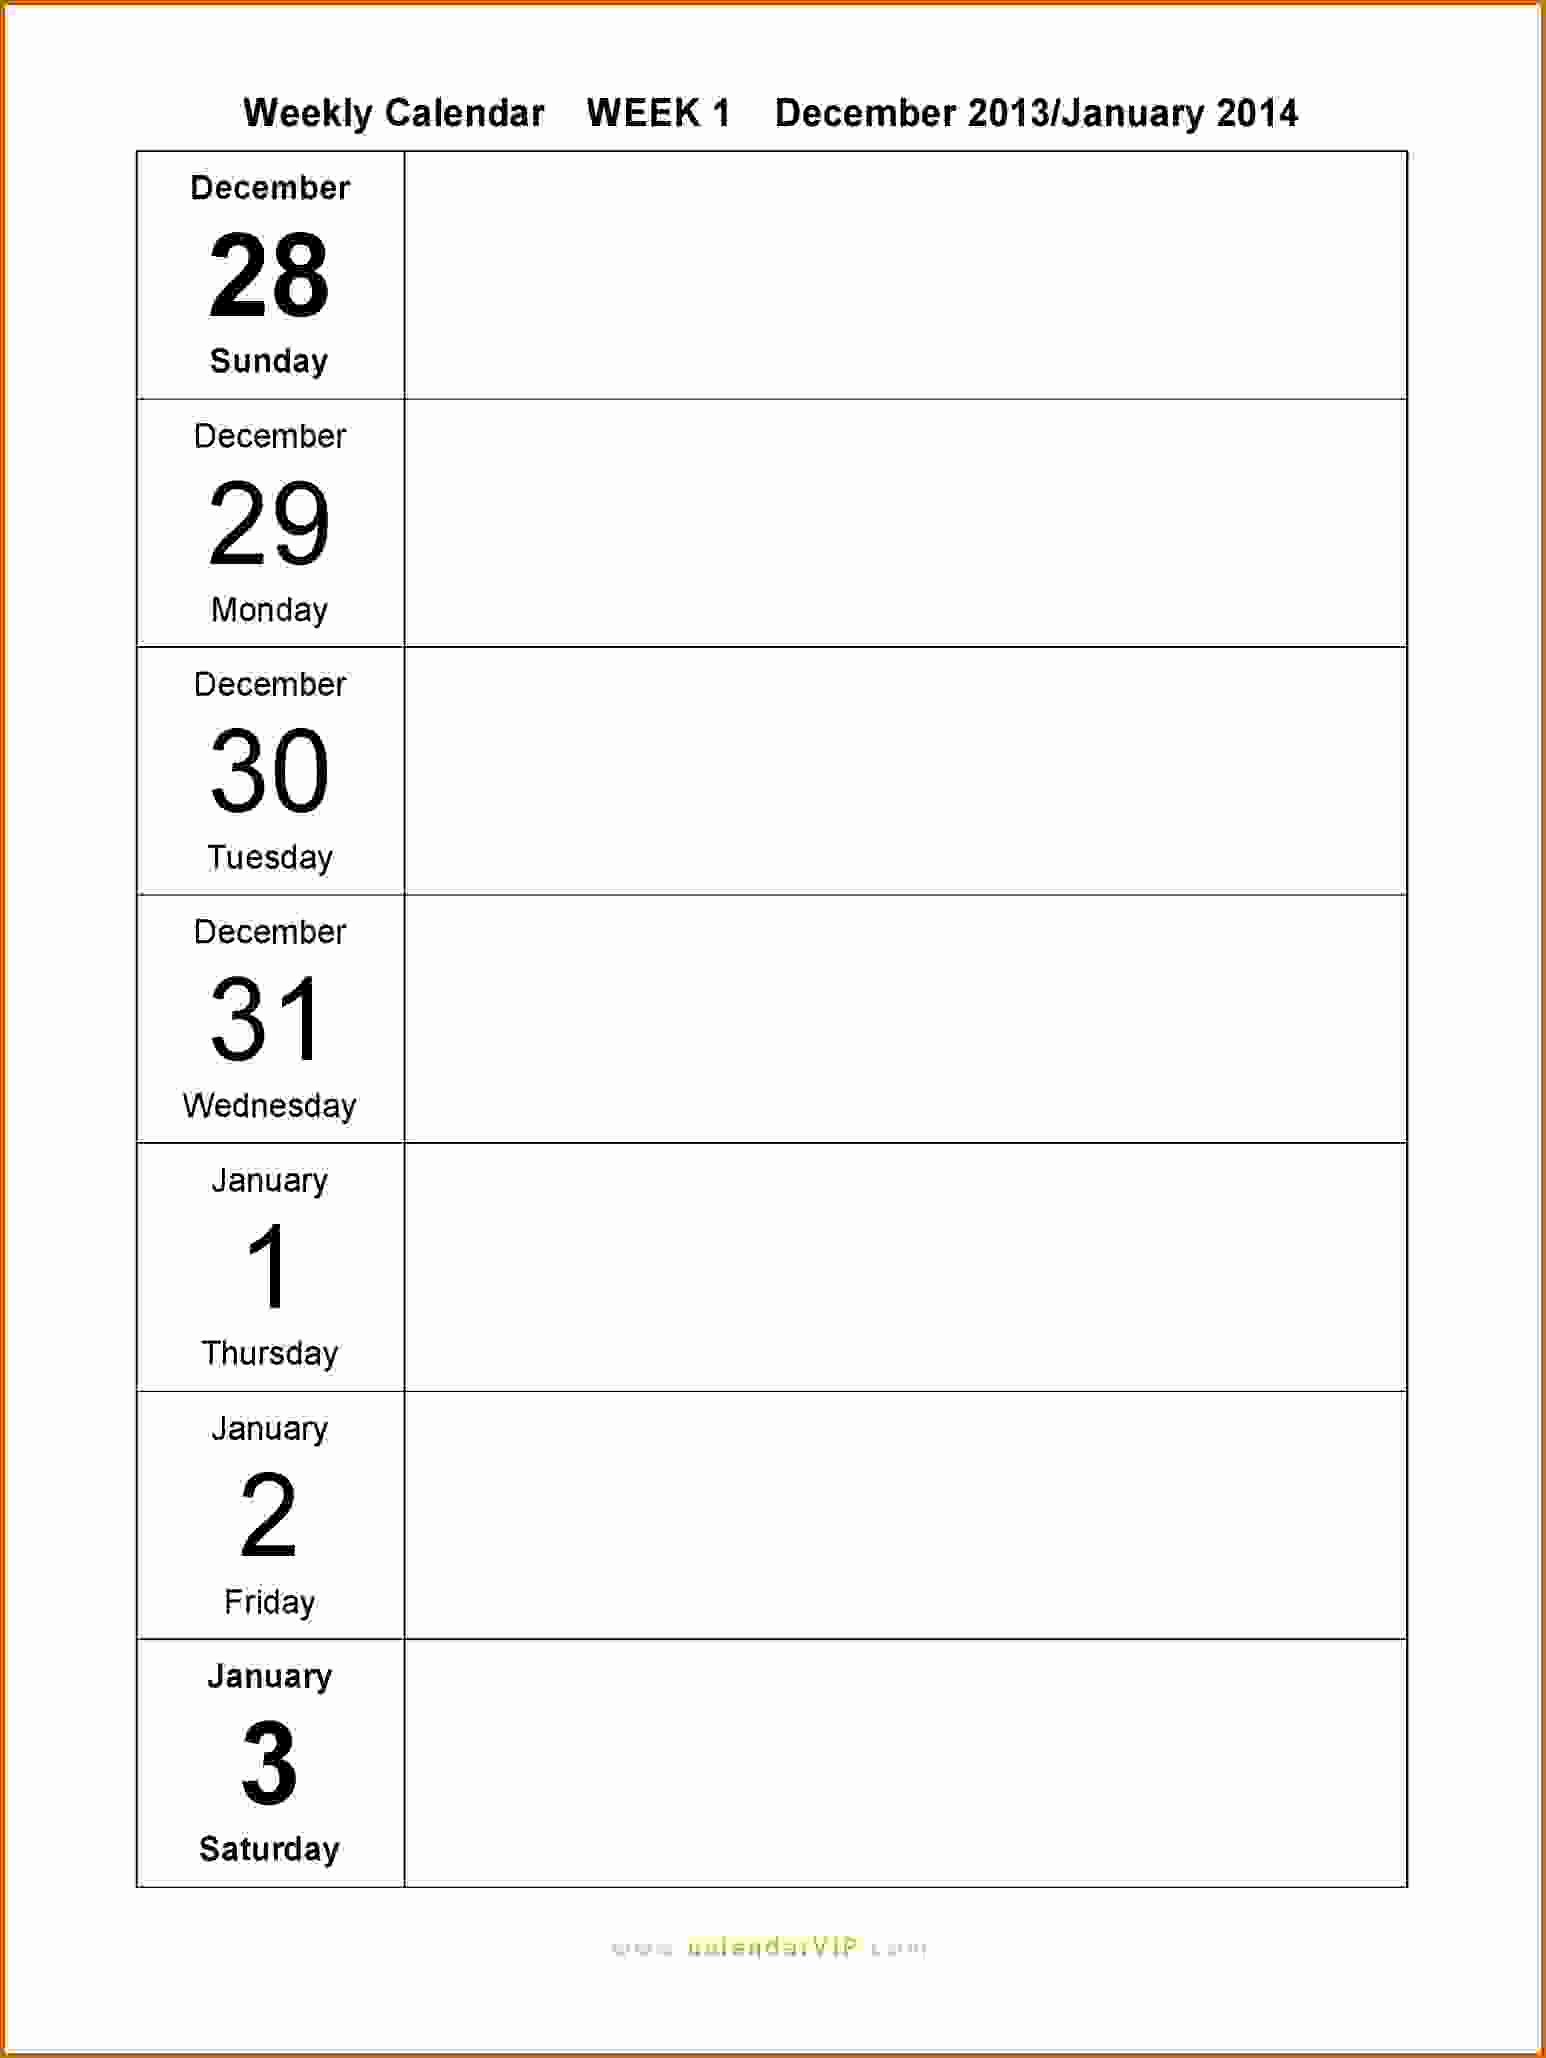 10 Free Weekly Printable Calendar Templates